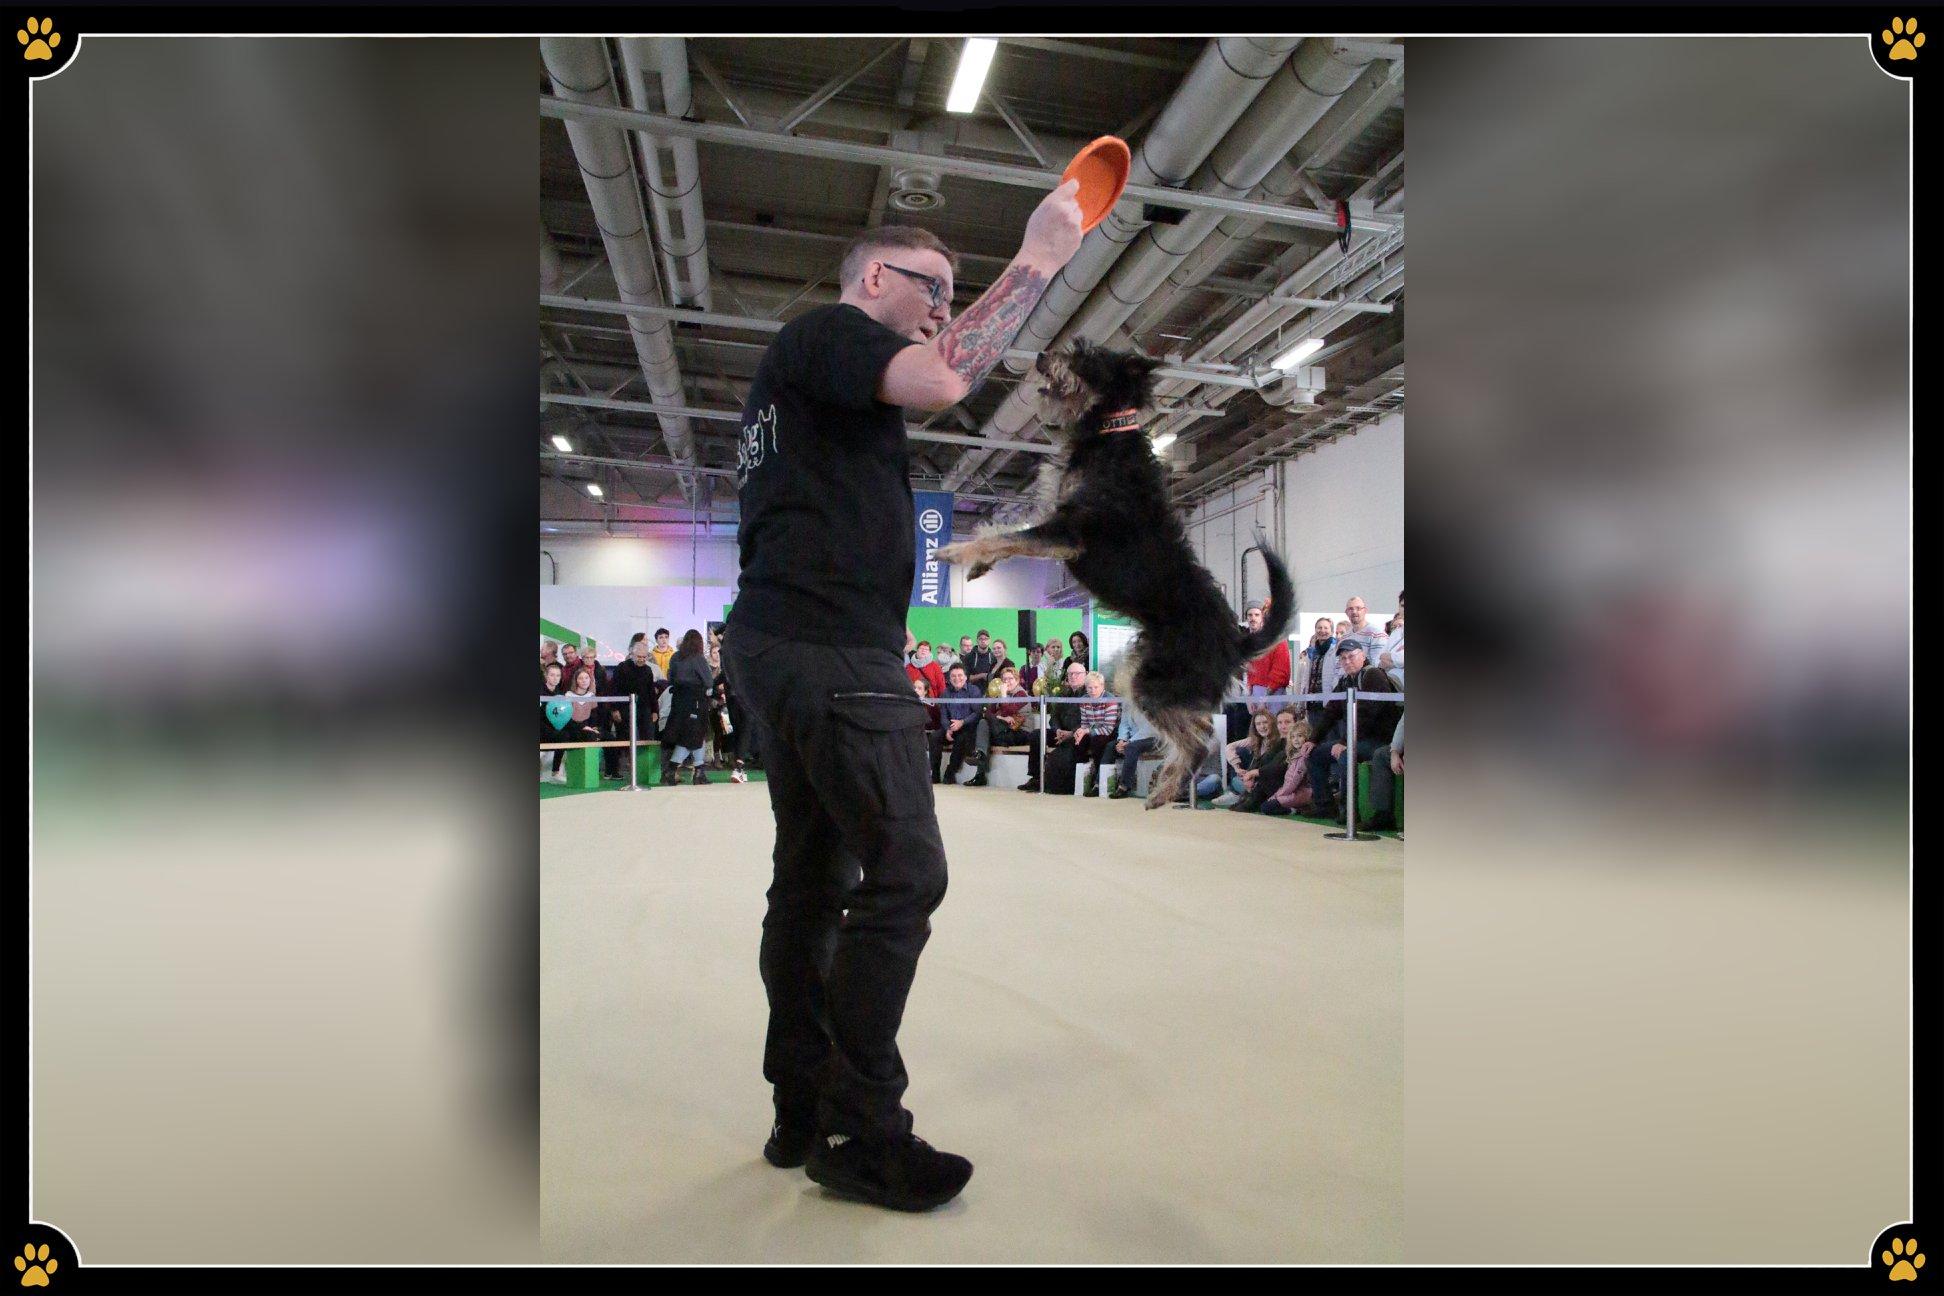 JoBaDog_Gruene_Woche_2019_Frisbee_2.jpg